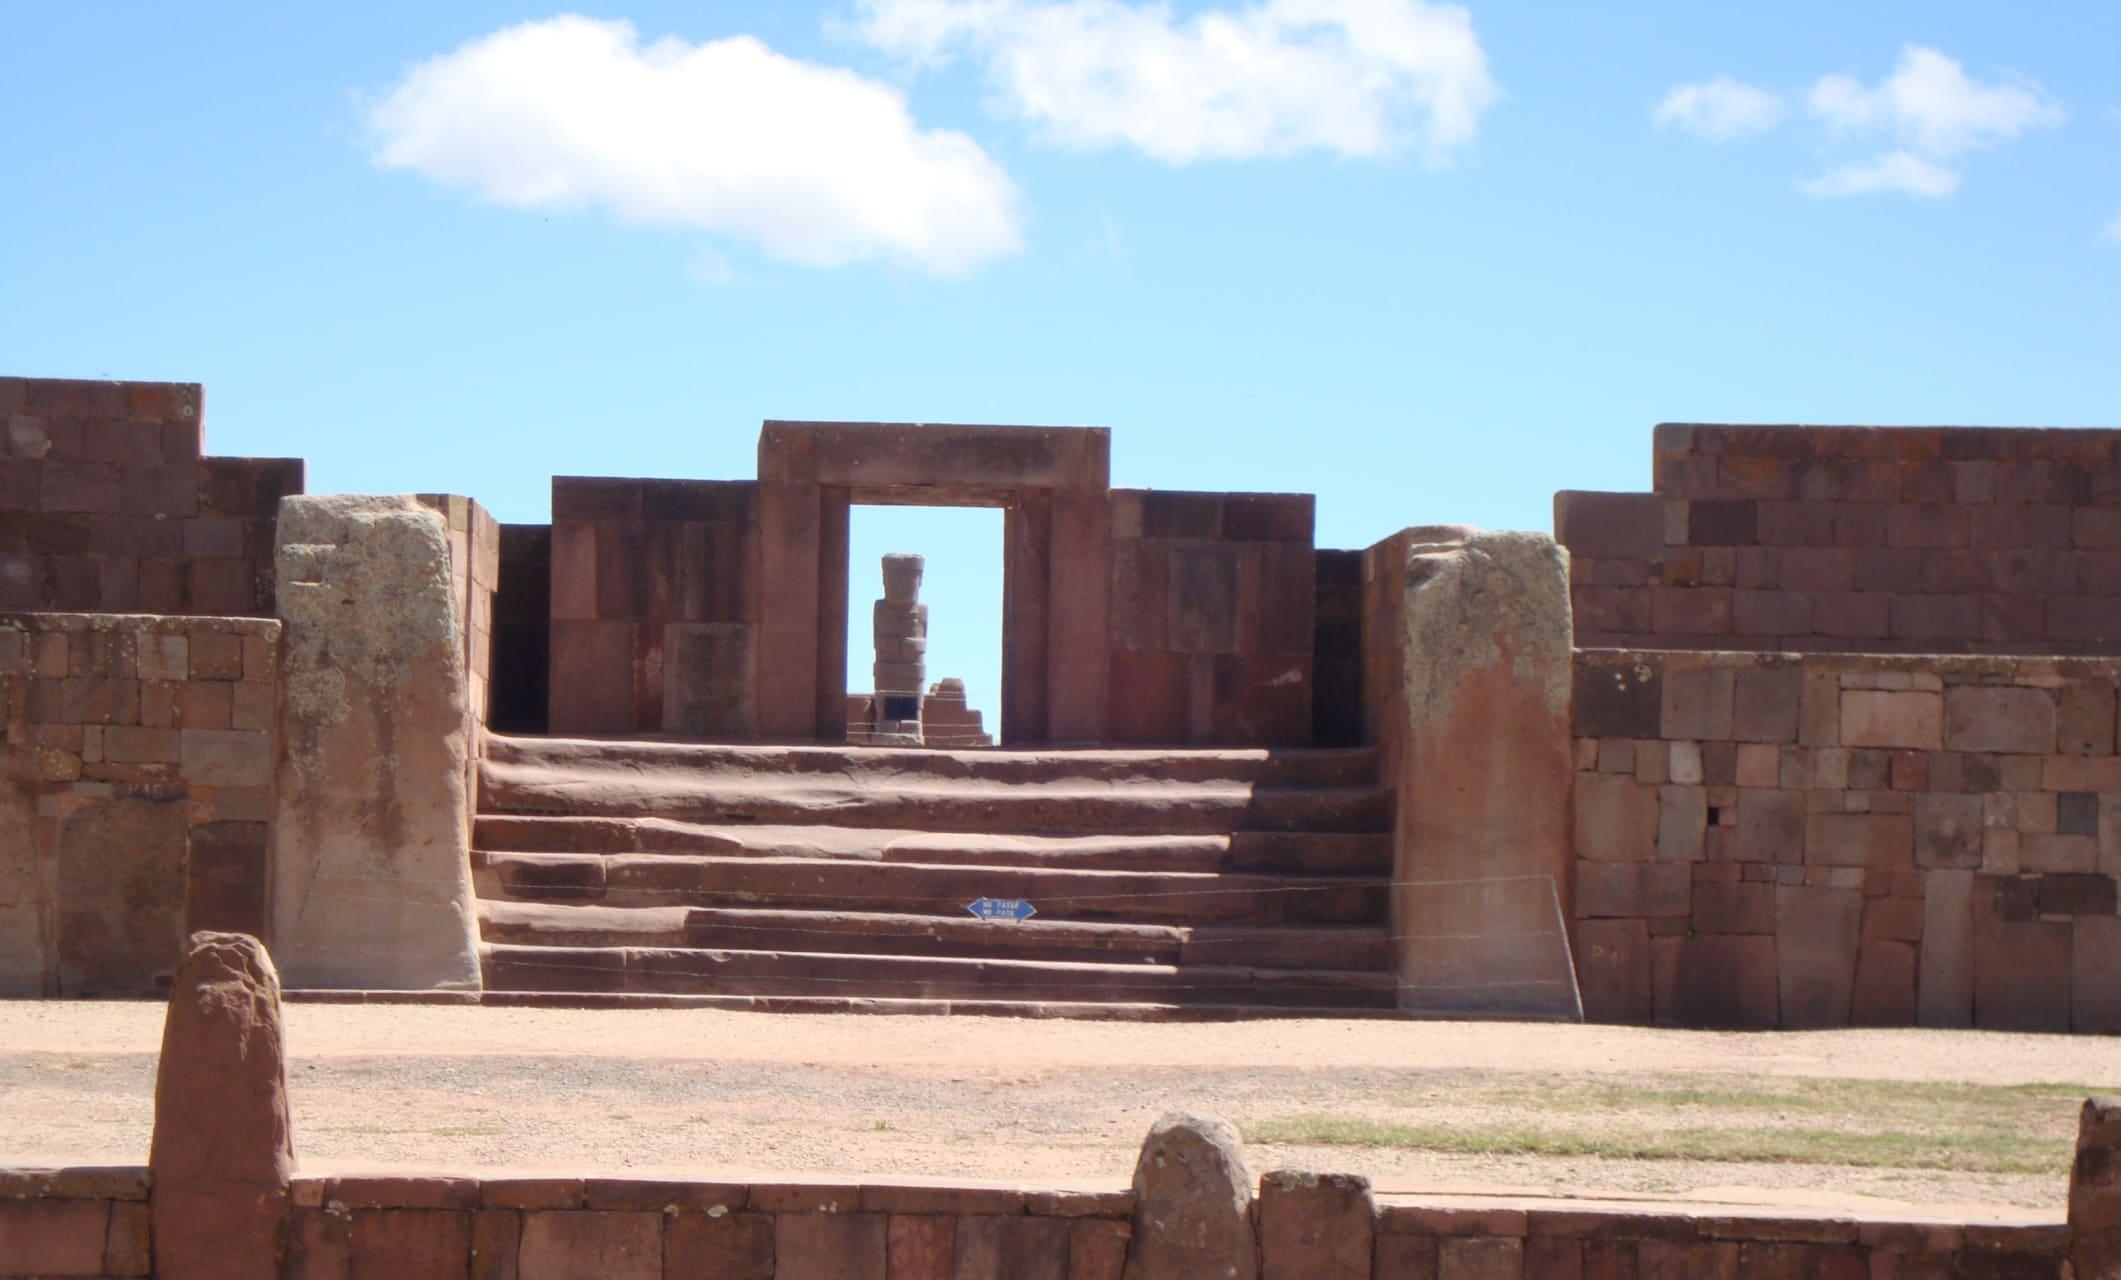 La Paz - Tiwanaku: Hidden Millennial Culture